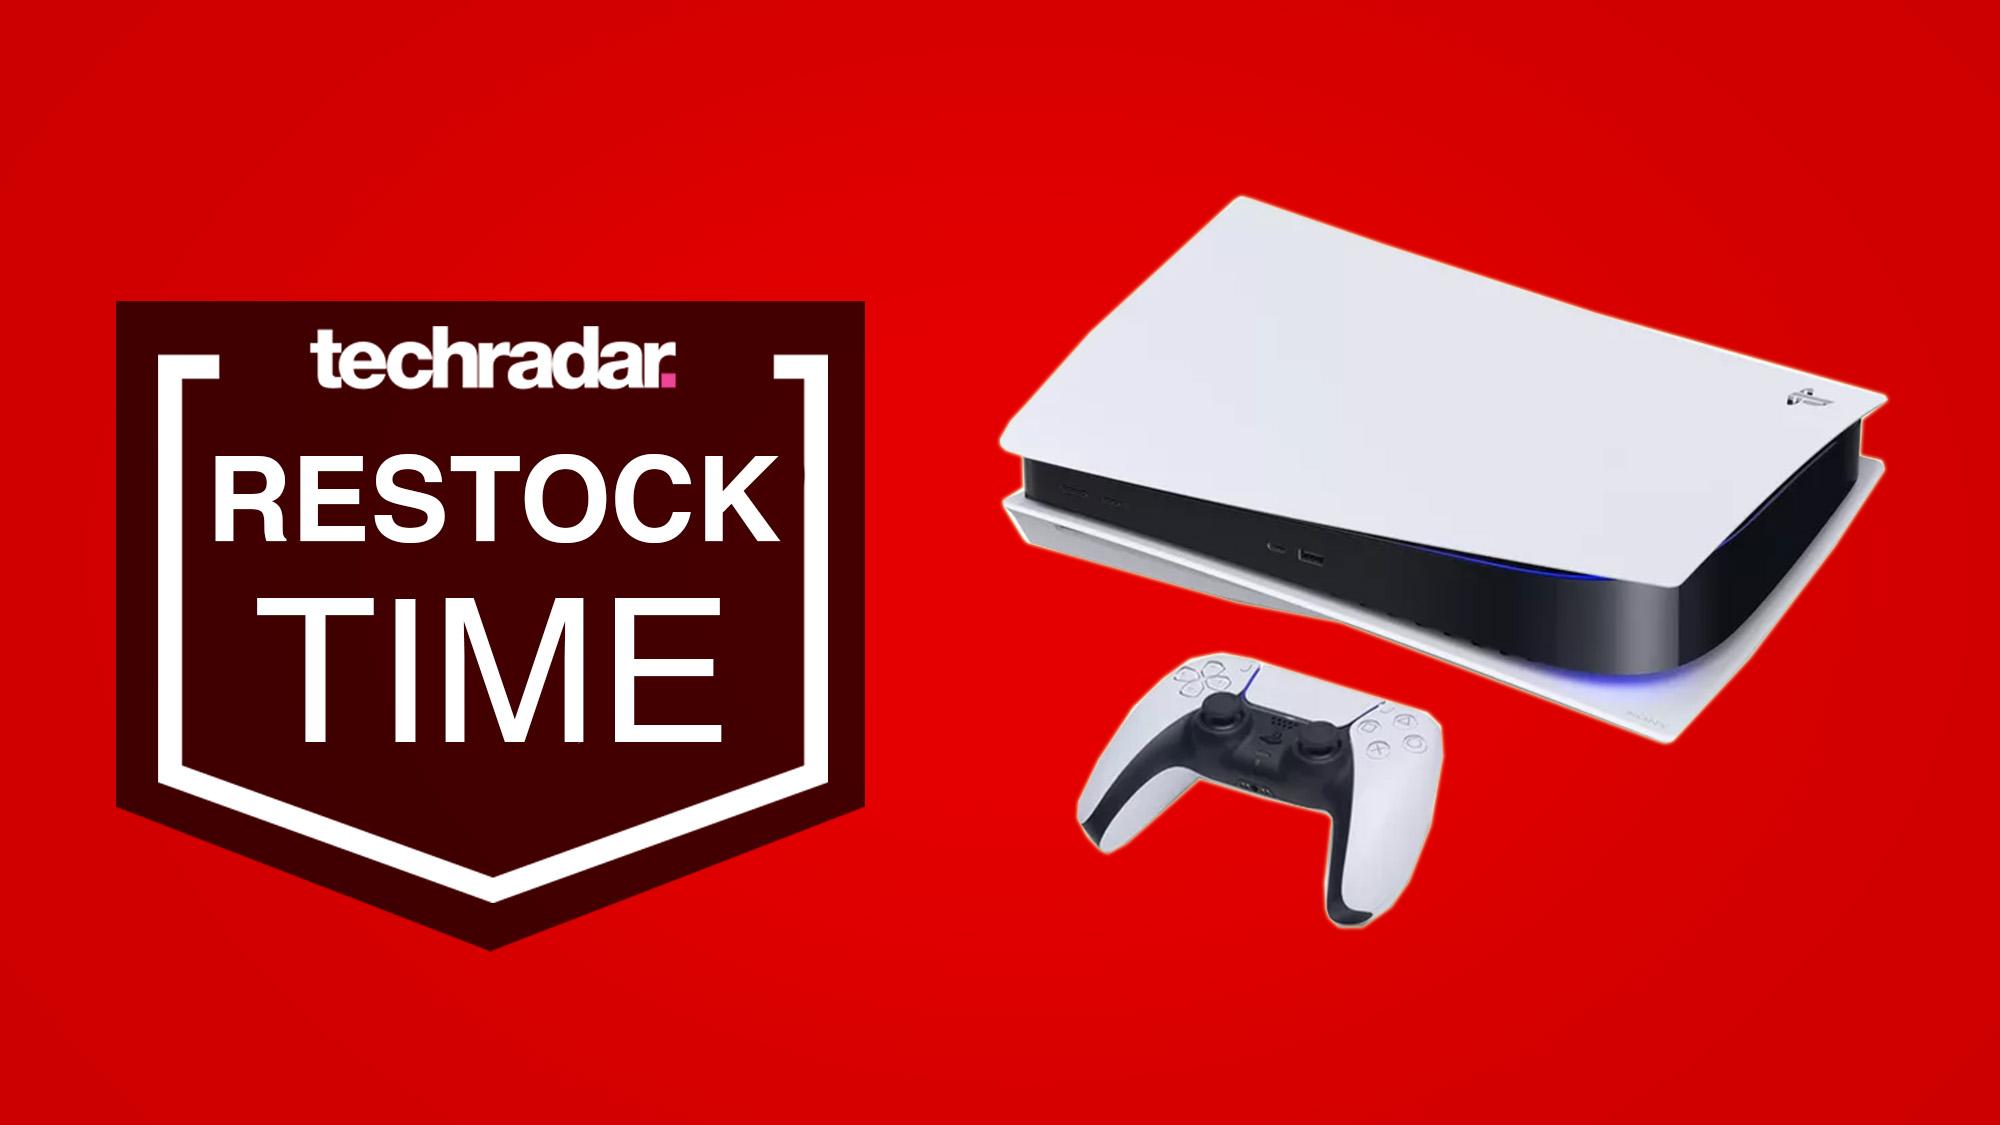 ps5-restock-update:-best-buy,-target-and-gamestop-–-when-to-buy-it-this-week